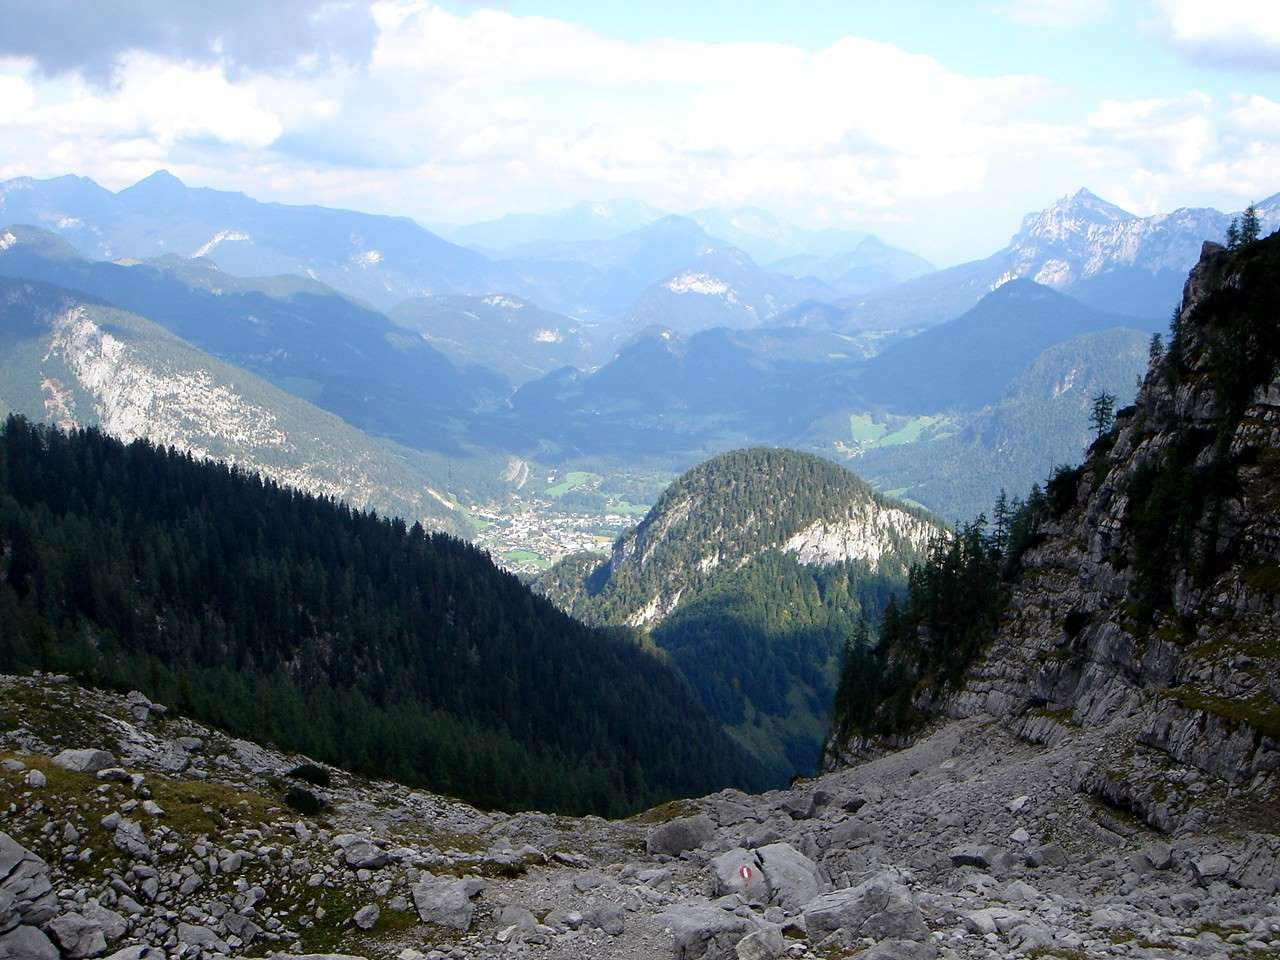 Foto: Manfred Karl / Wander Tour / Großes Ochsenhorn über Schärdinger Steig / Blick hinaus nach Lofer / 16.06.2007 00:18:13